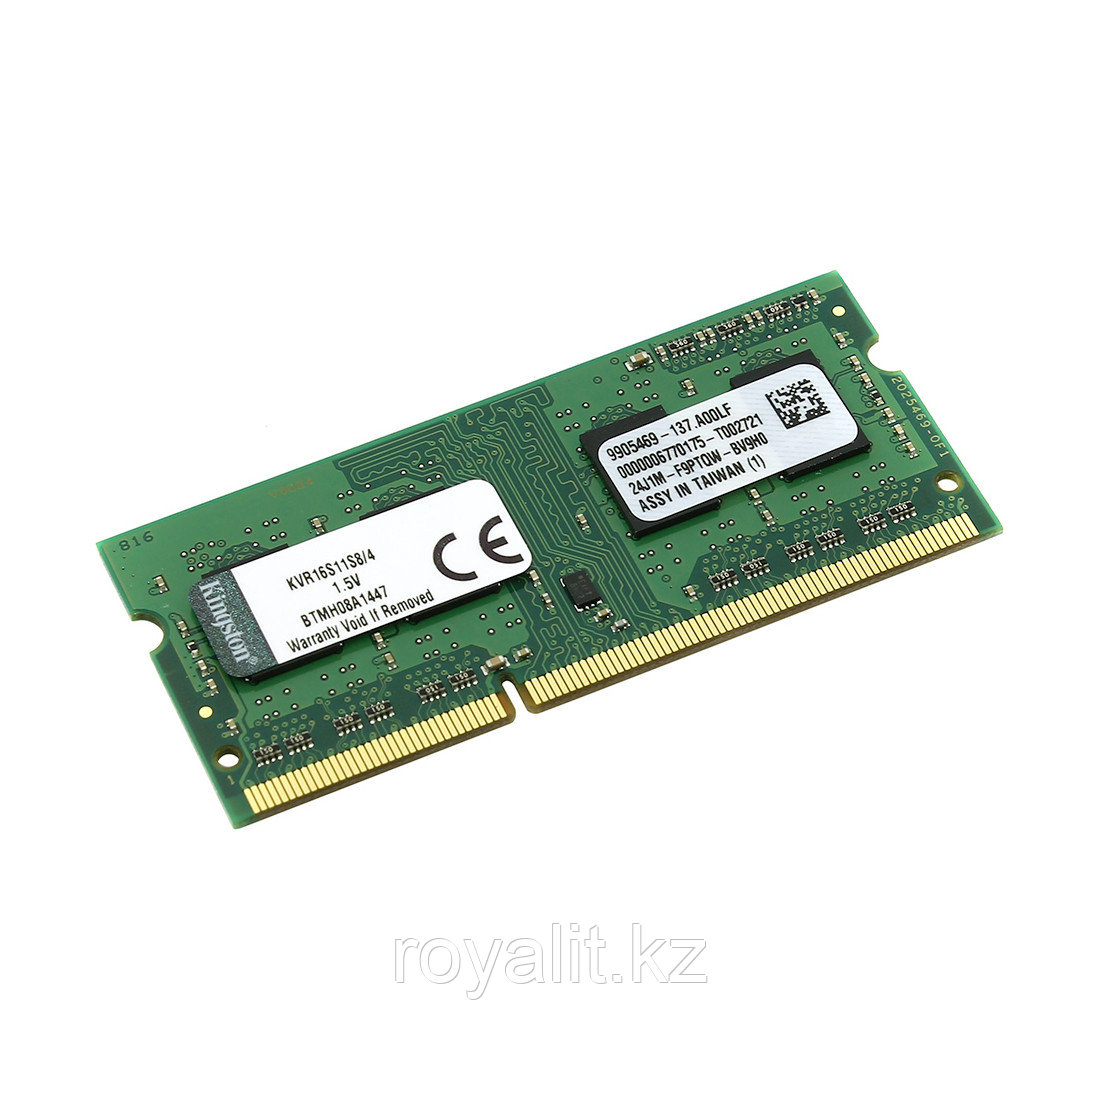 Модуль памяти Kingston DDR3 SODIMM 4Gb